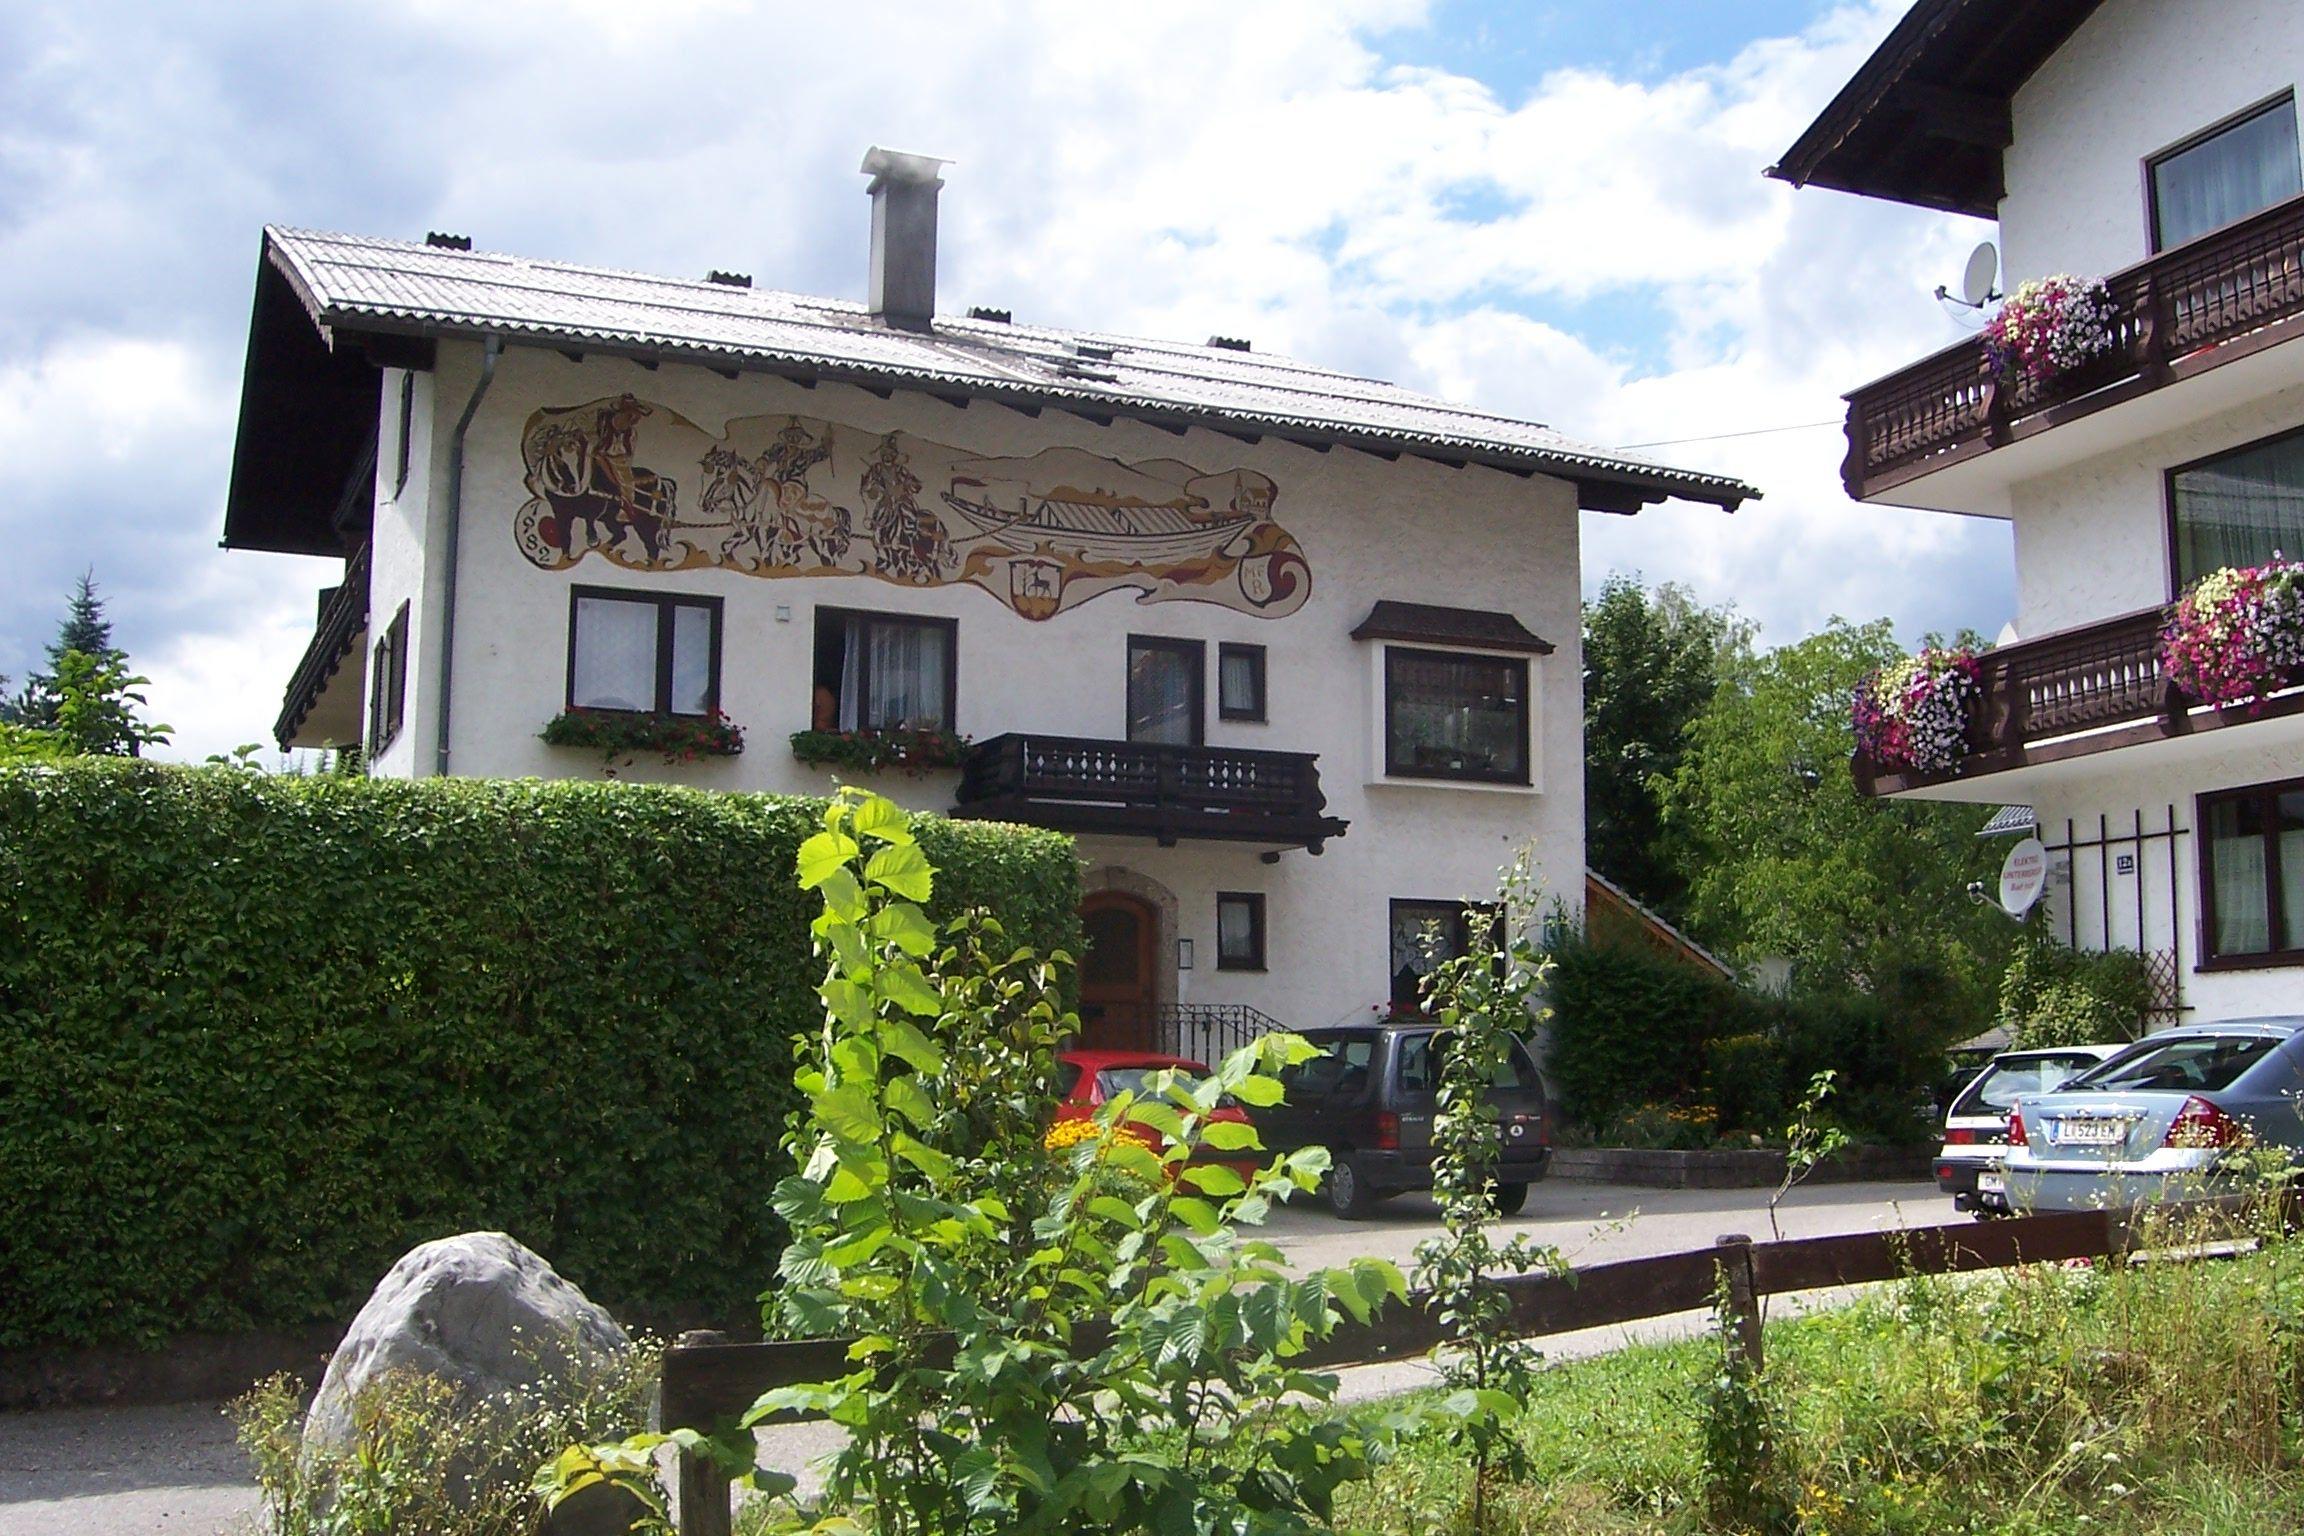 The way to Hallstatt